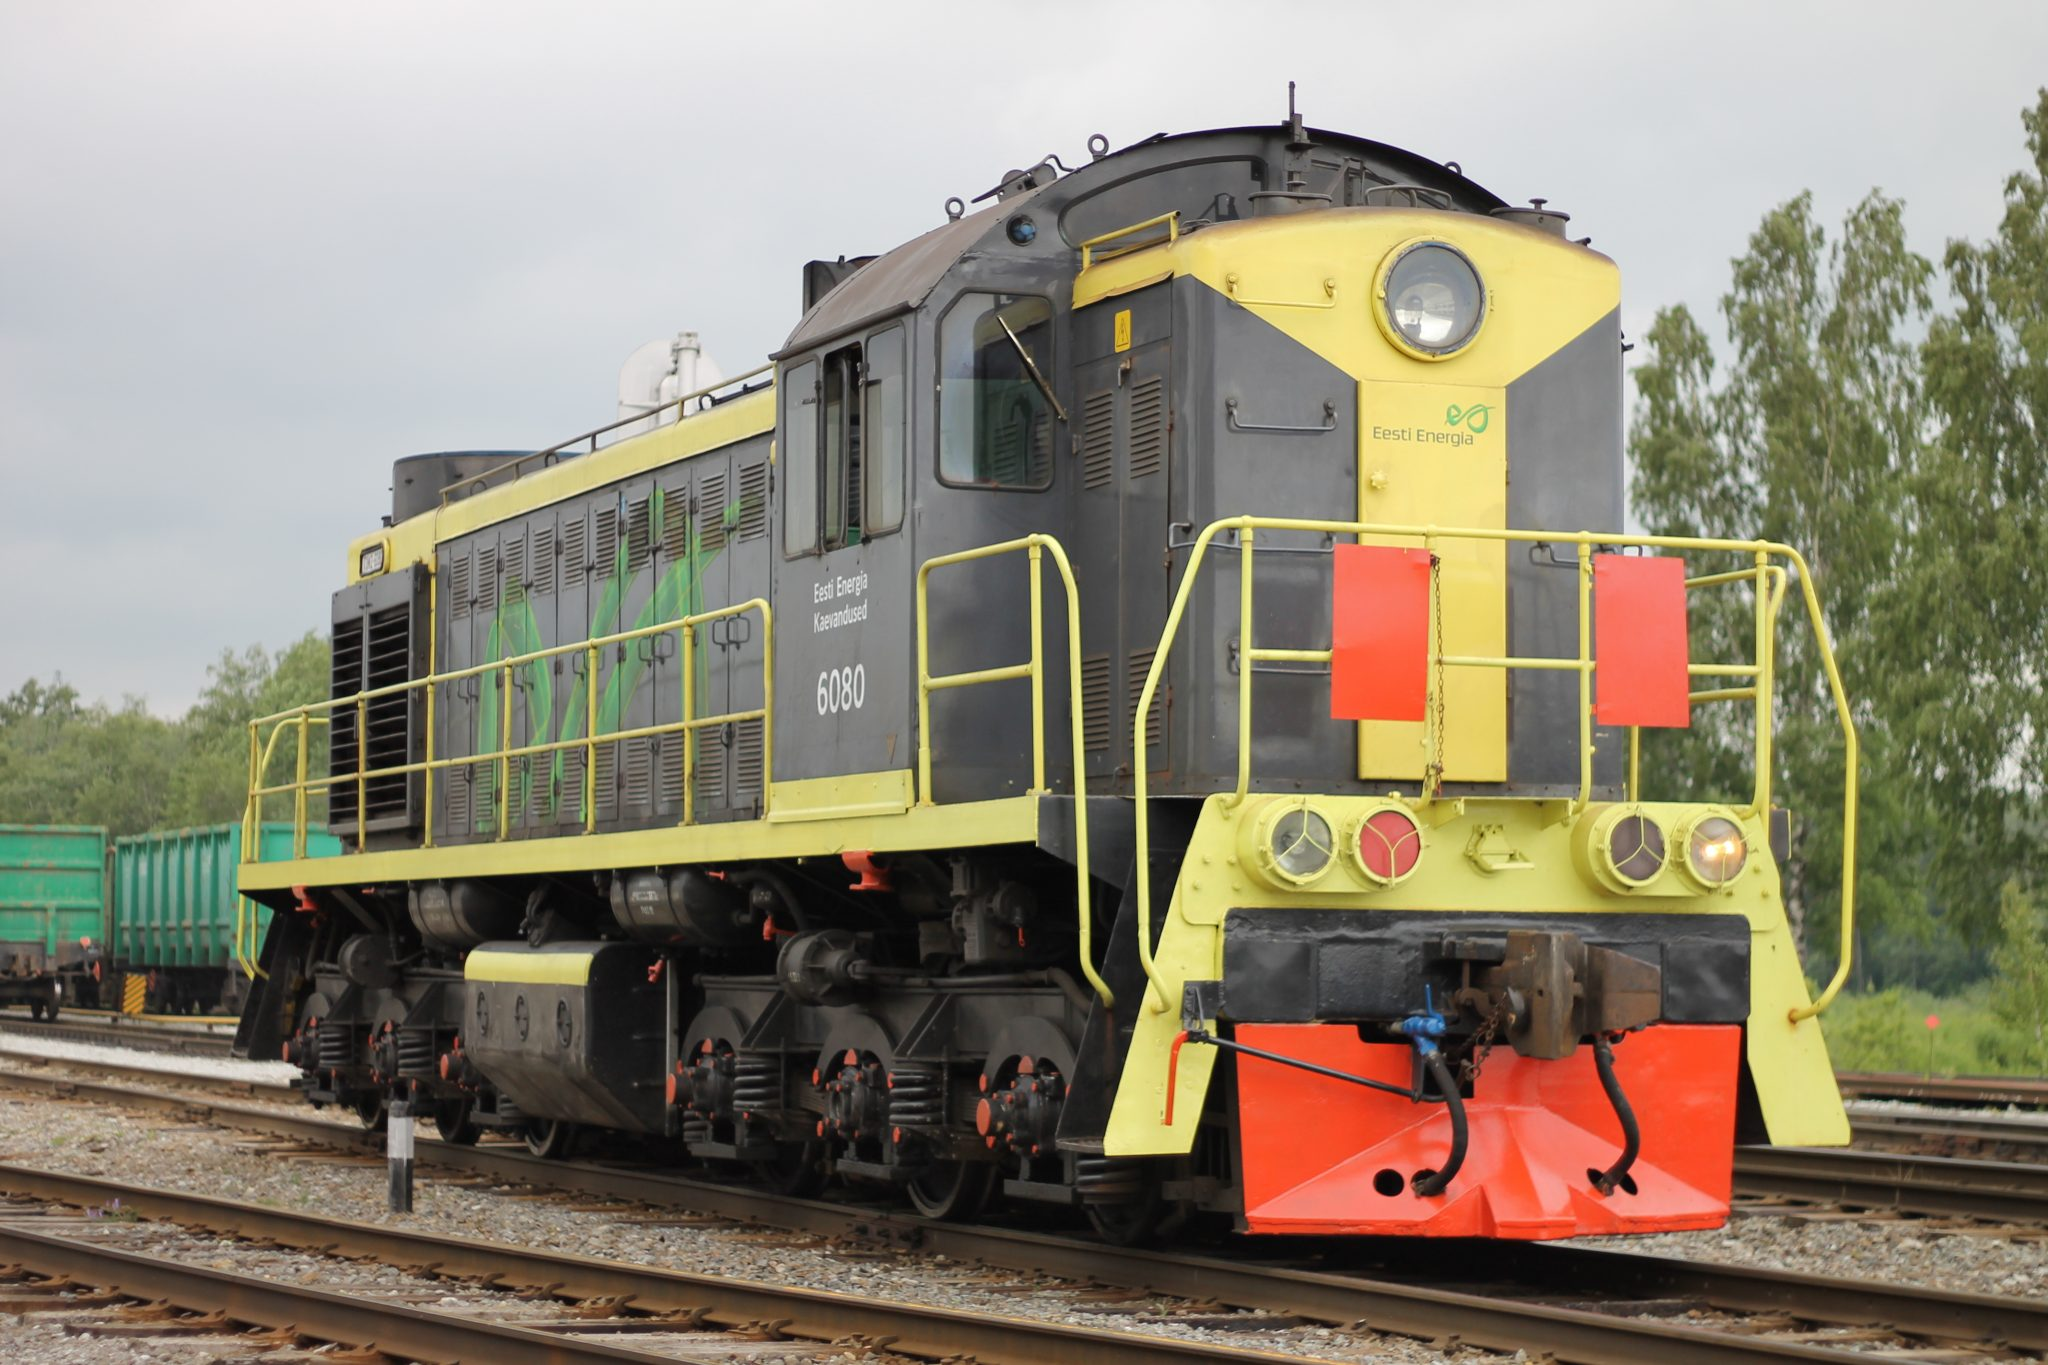 Latvian, Estonian duo to LNG retrofit two locomotives - Offshore Energy